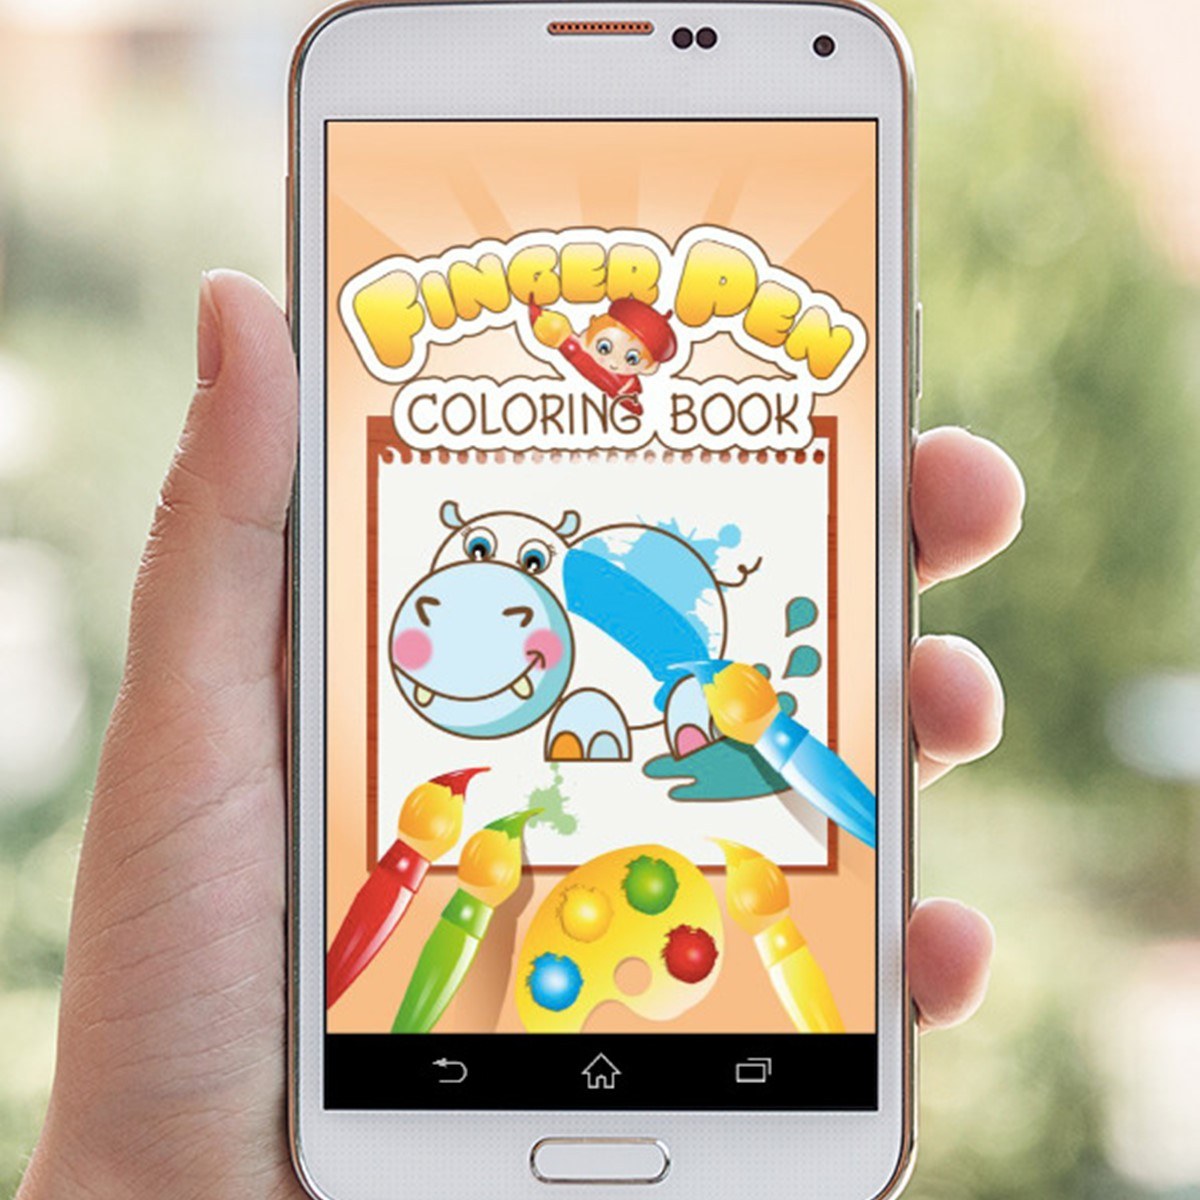 Kids Coloring Book Alternatives and Similar Apps - AlternativeTo.net